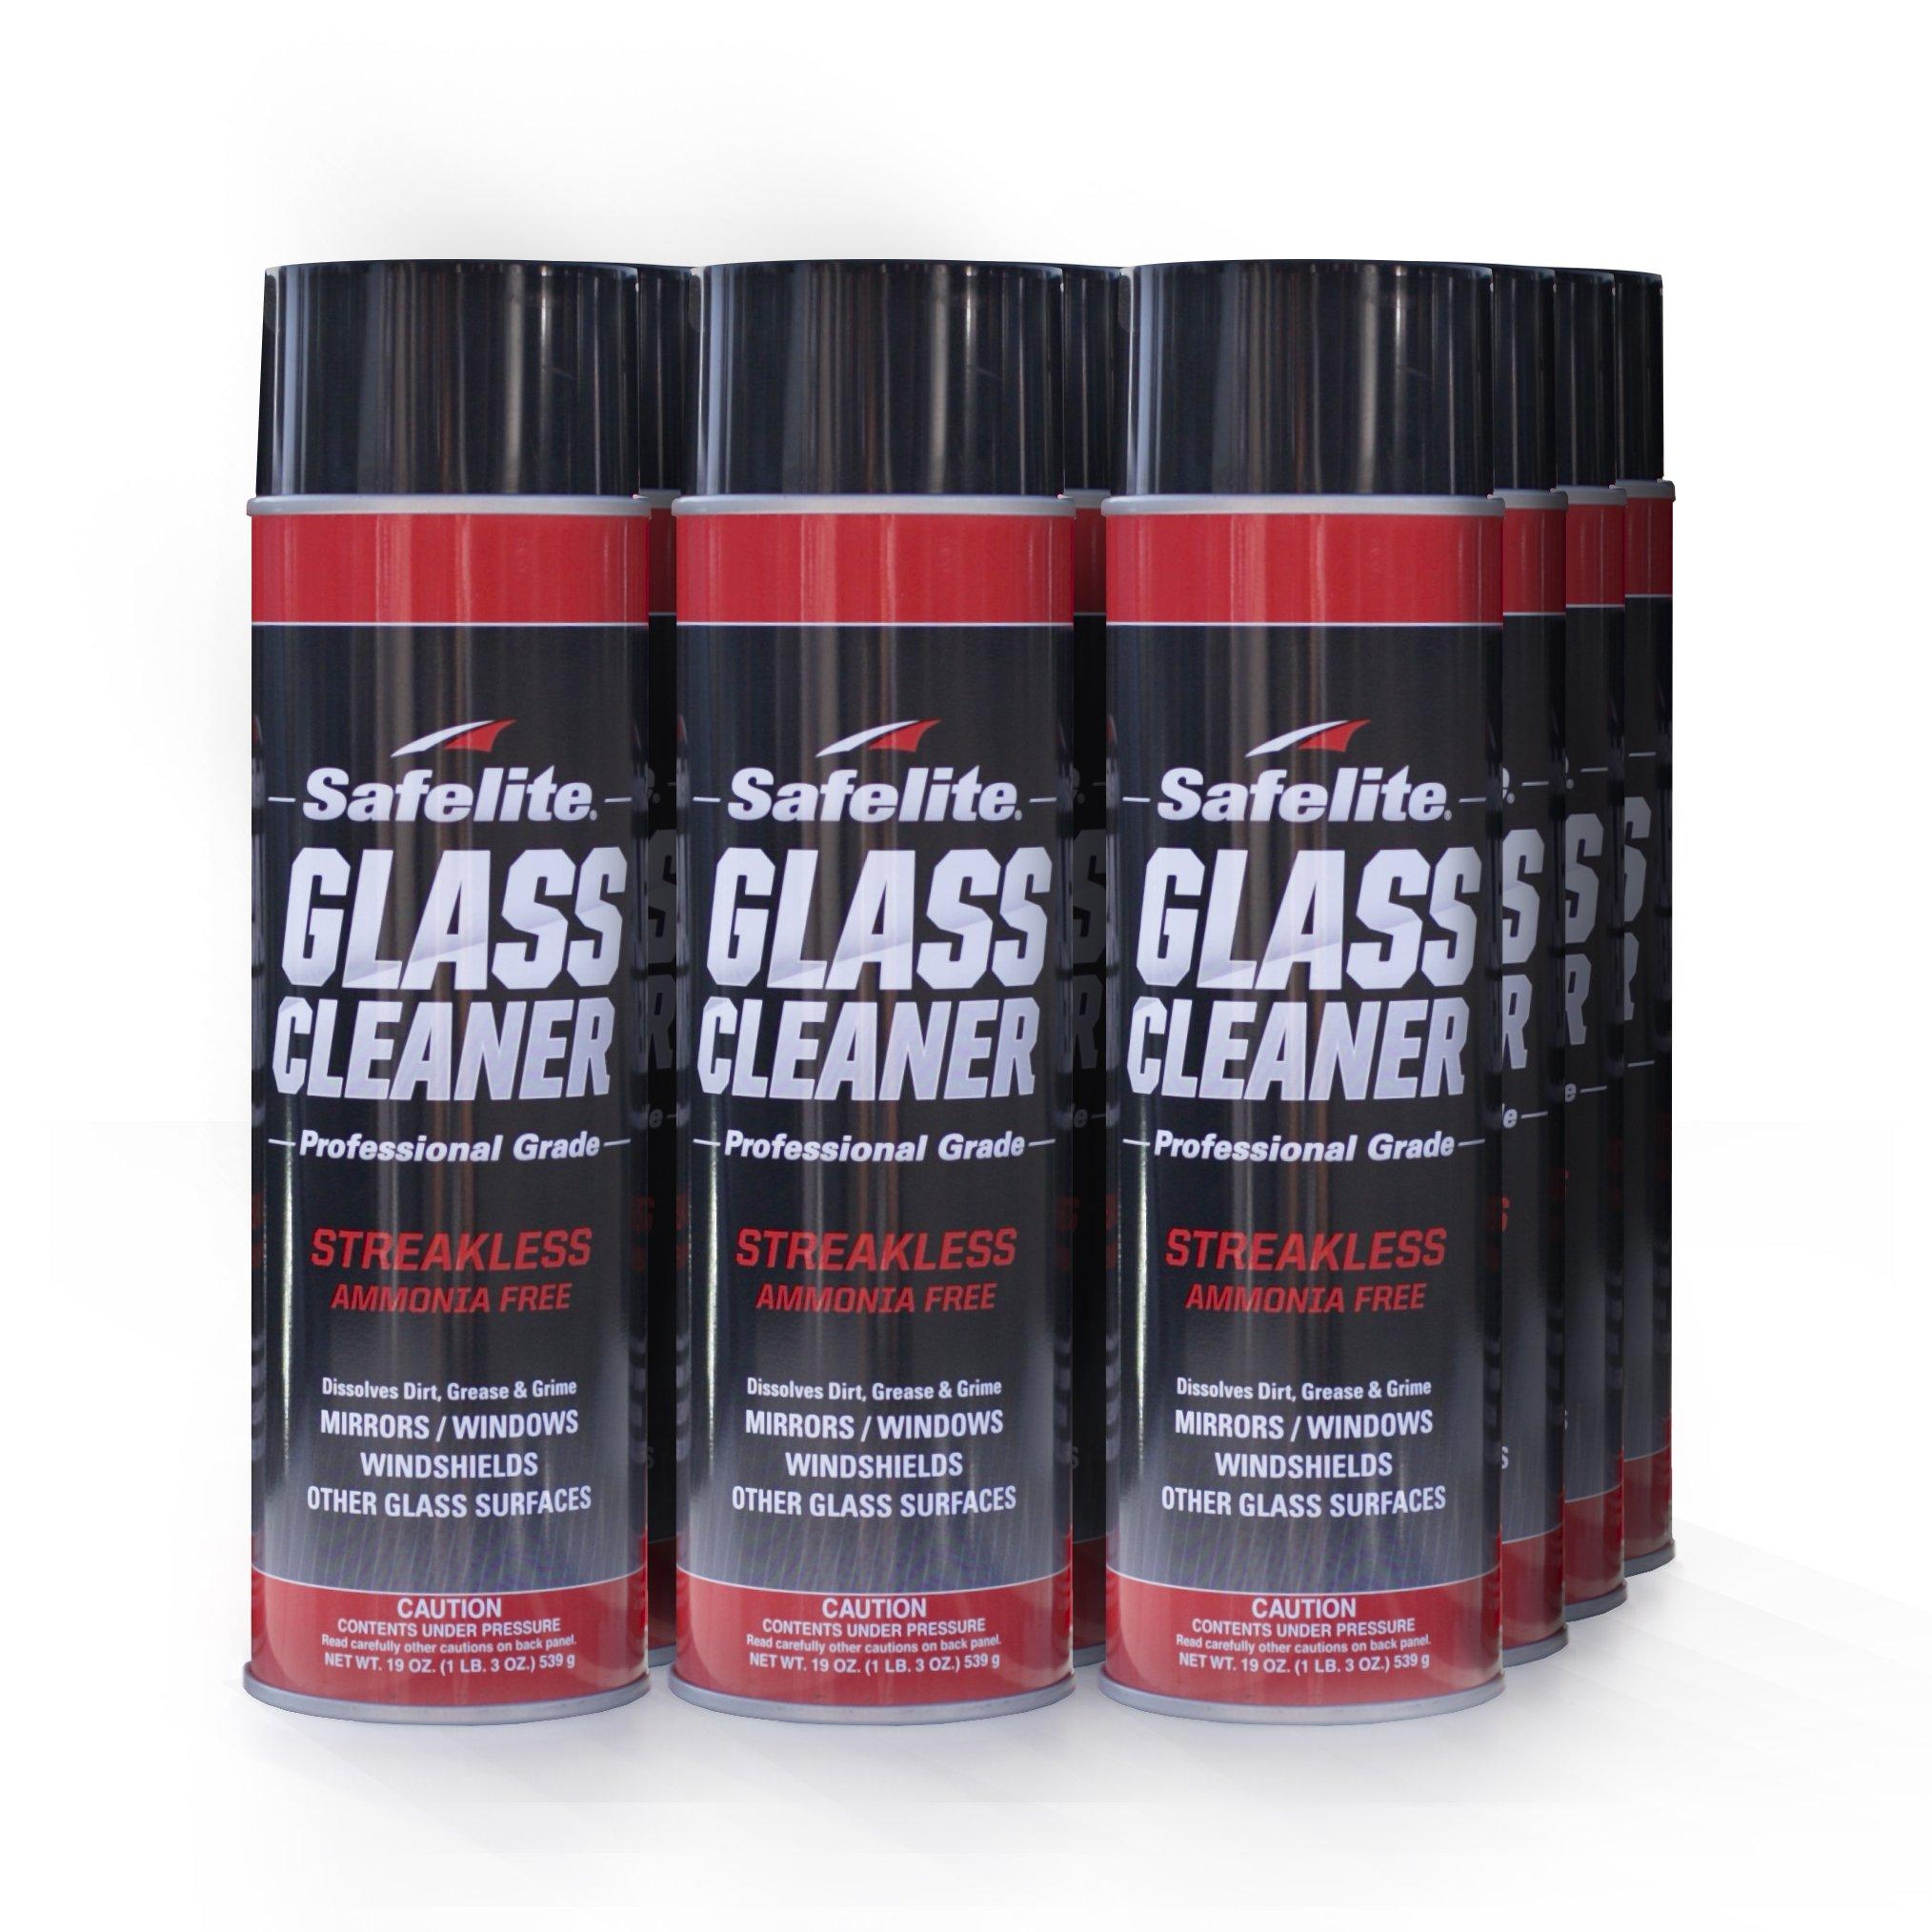 SAFELITE AUTOGLASS Safelite Glass Cleaner, 19 oz, 12 Pack